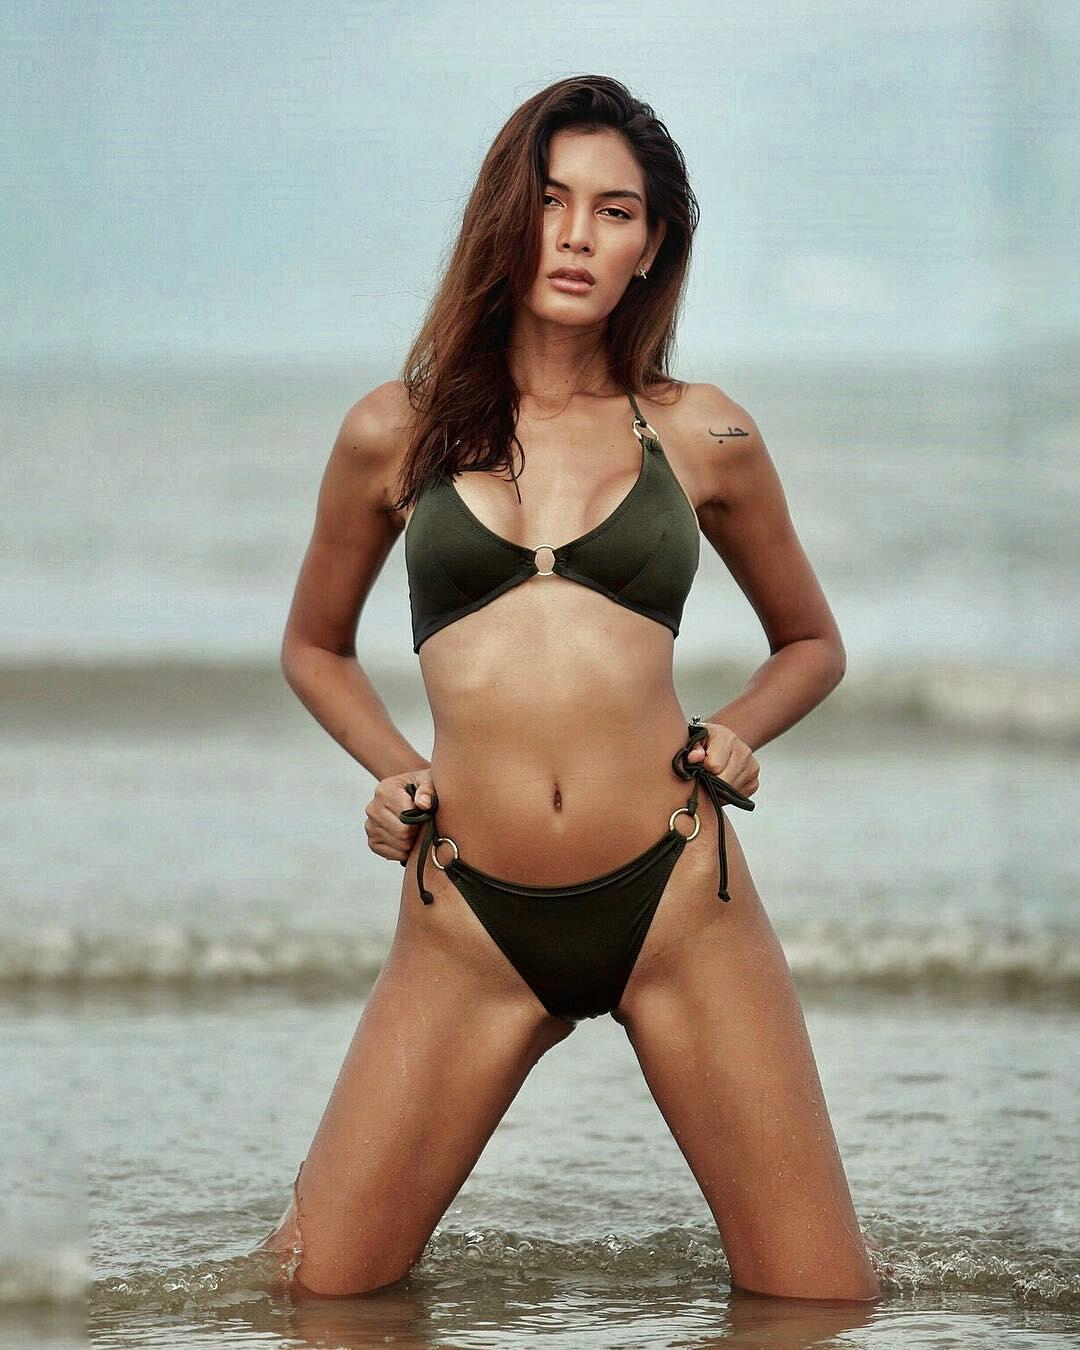 Natachat Chanchiew  Most Beautiful Thailand Transgender -8299